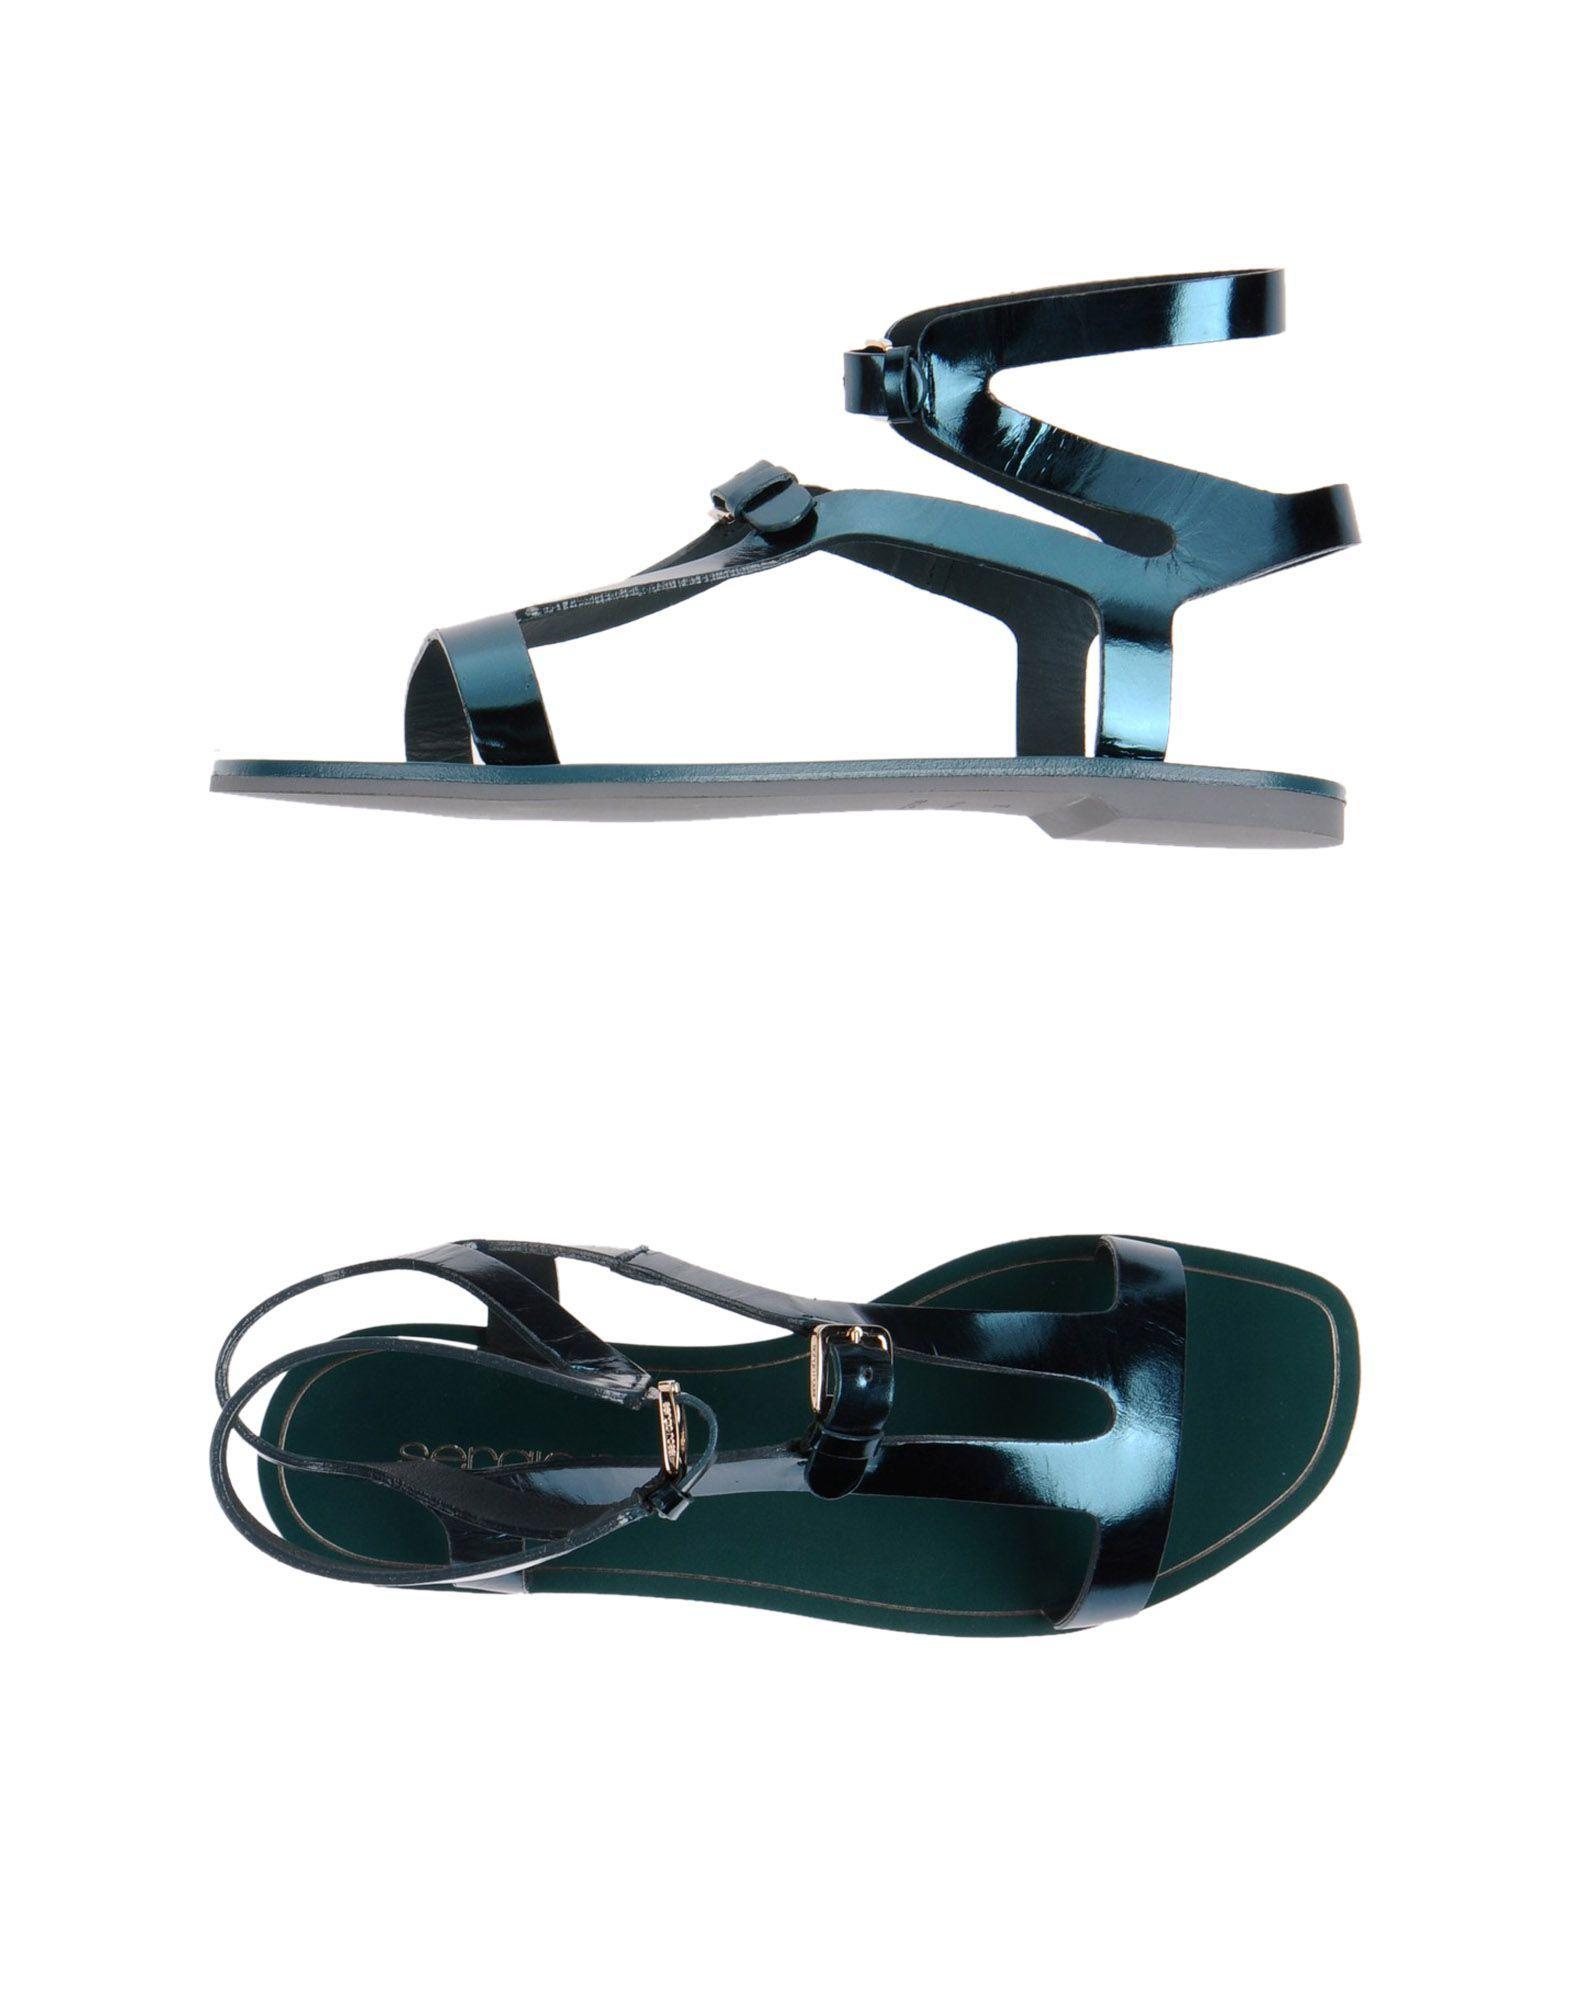 Sergio rossi Women - Footwear - Sandals Sergio rossi on YOOX